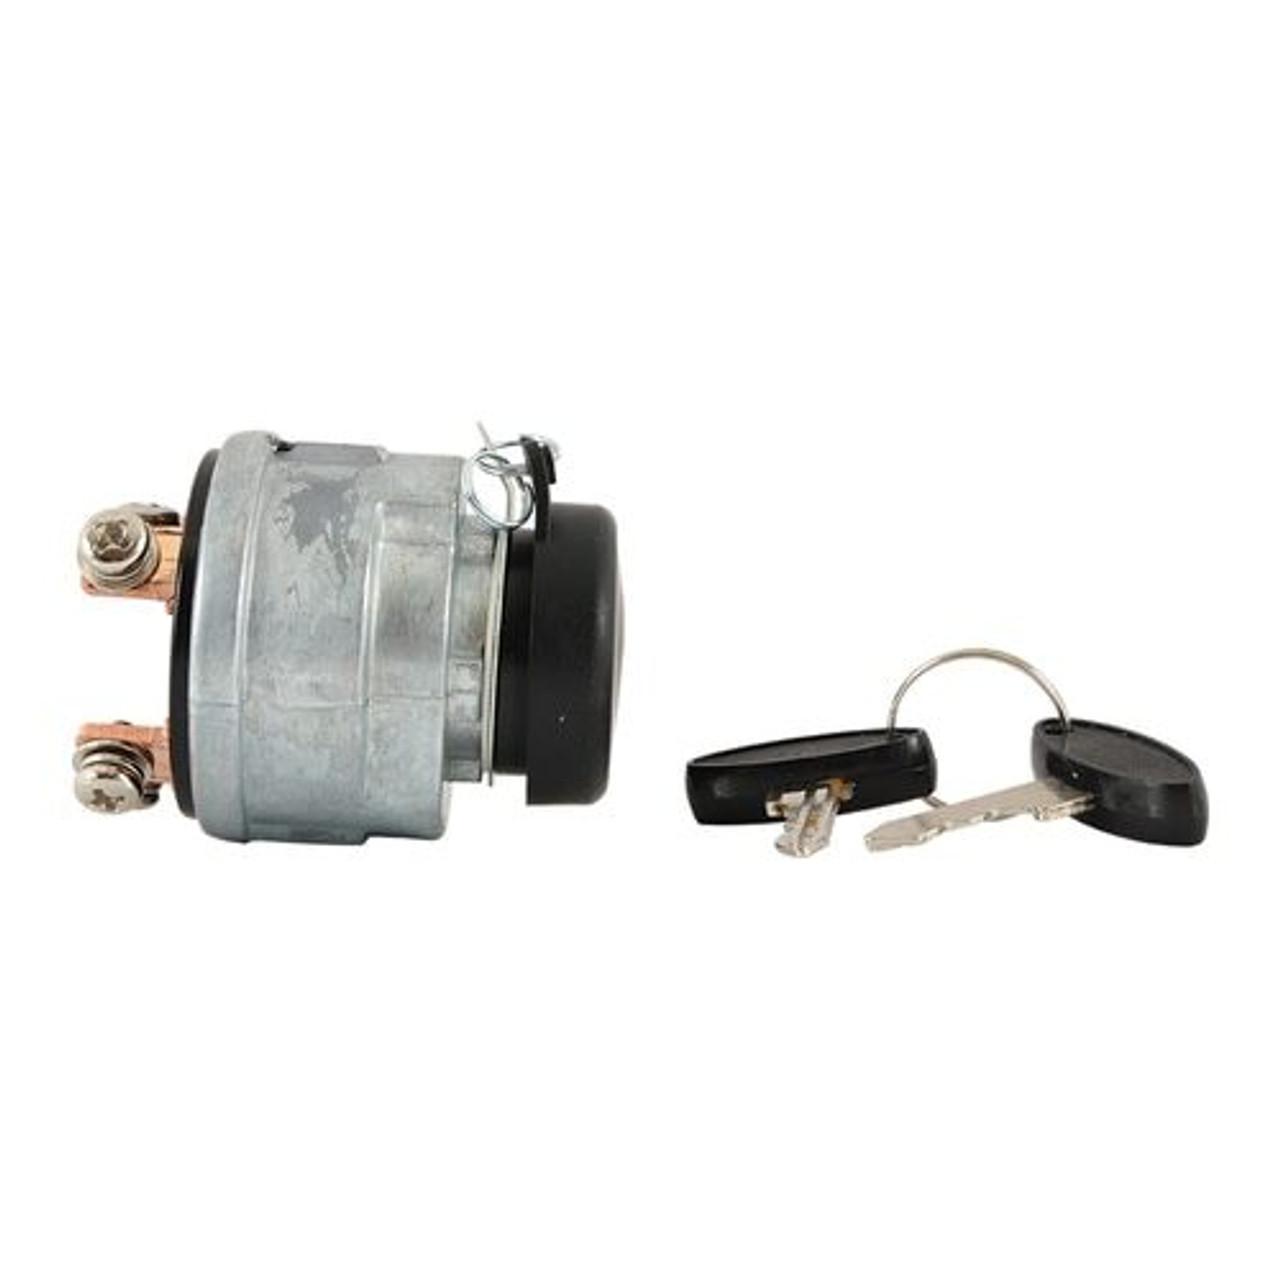 Ignition Switch fits Allis, Massey Ferguson, Ford SBA385200330, SBA385200331, 72098283, 3280565M92